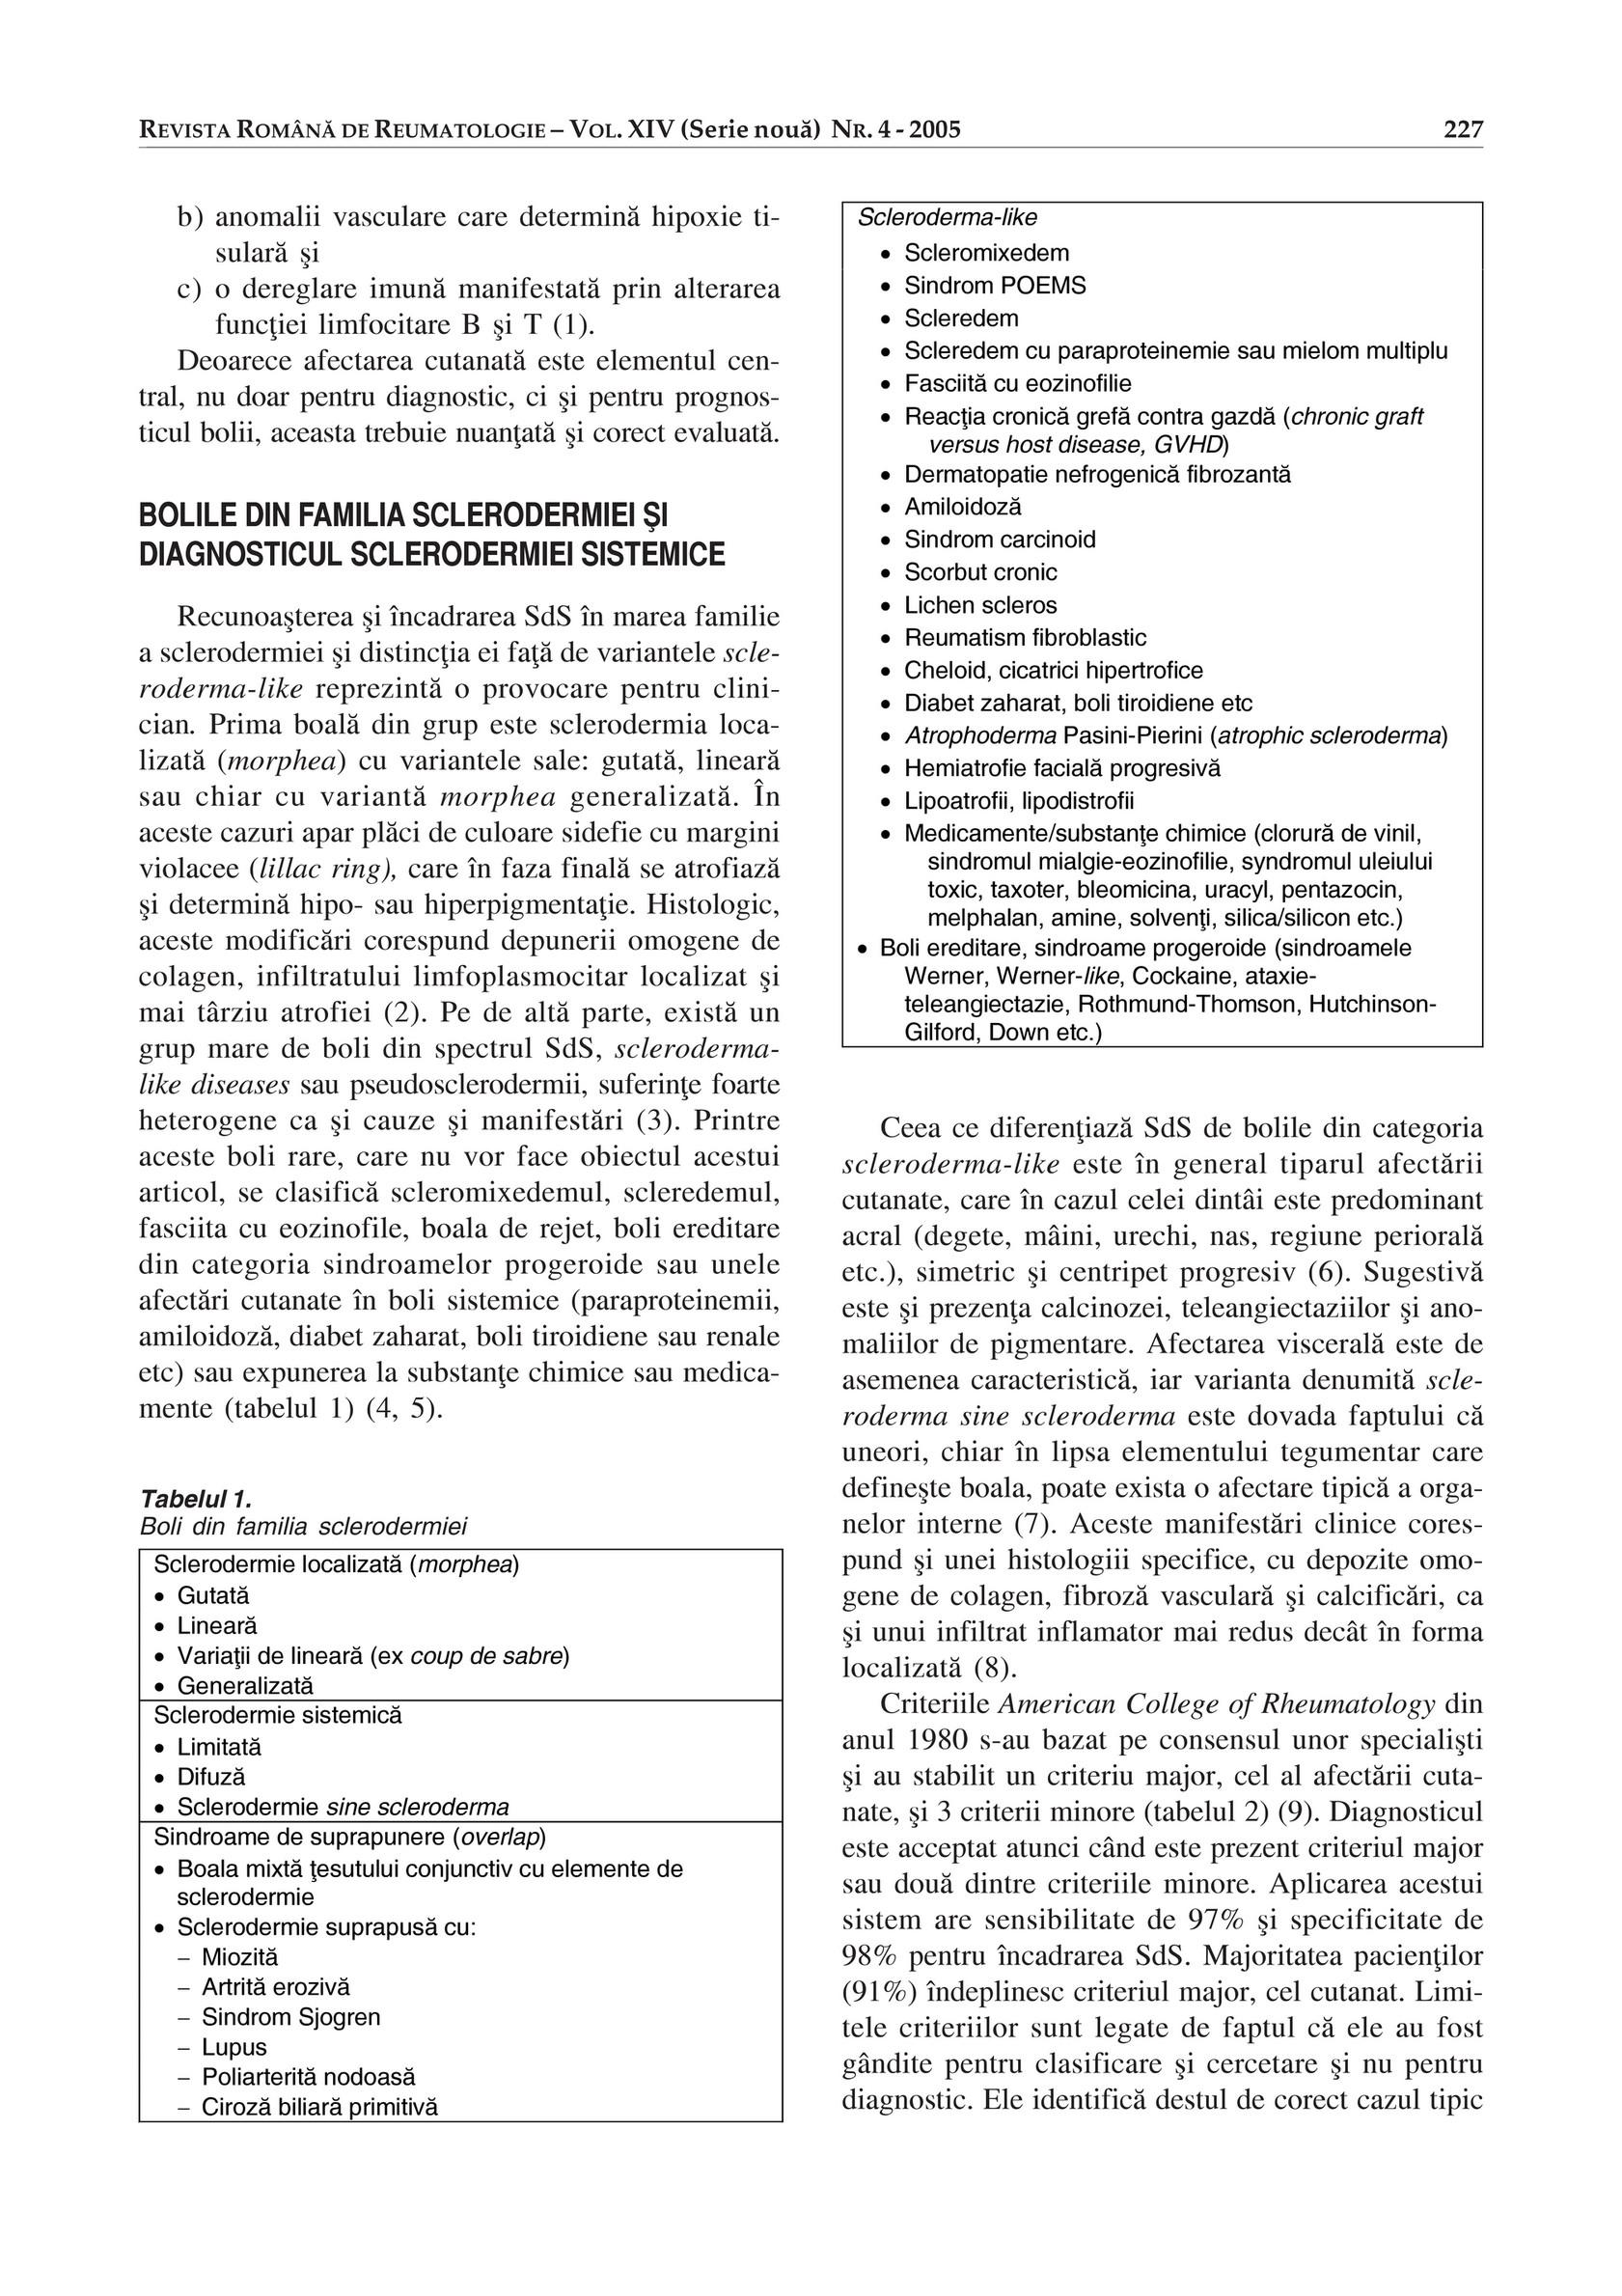 Boala țesutului conjunctiv - Connective tissue disease - studioharry.ro